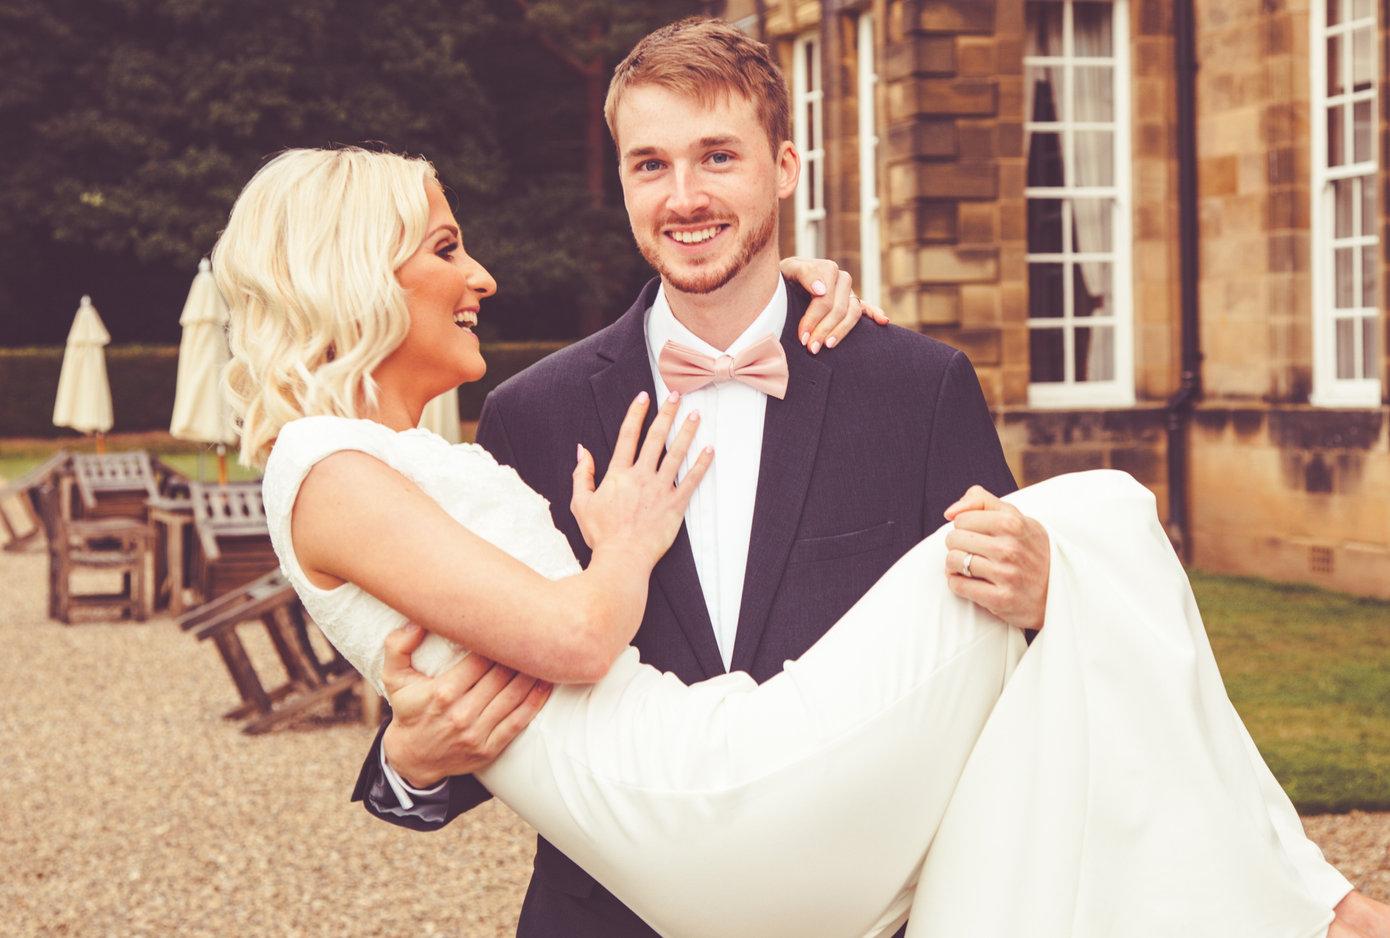 The Wedding groom carries his bride at Crathorne